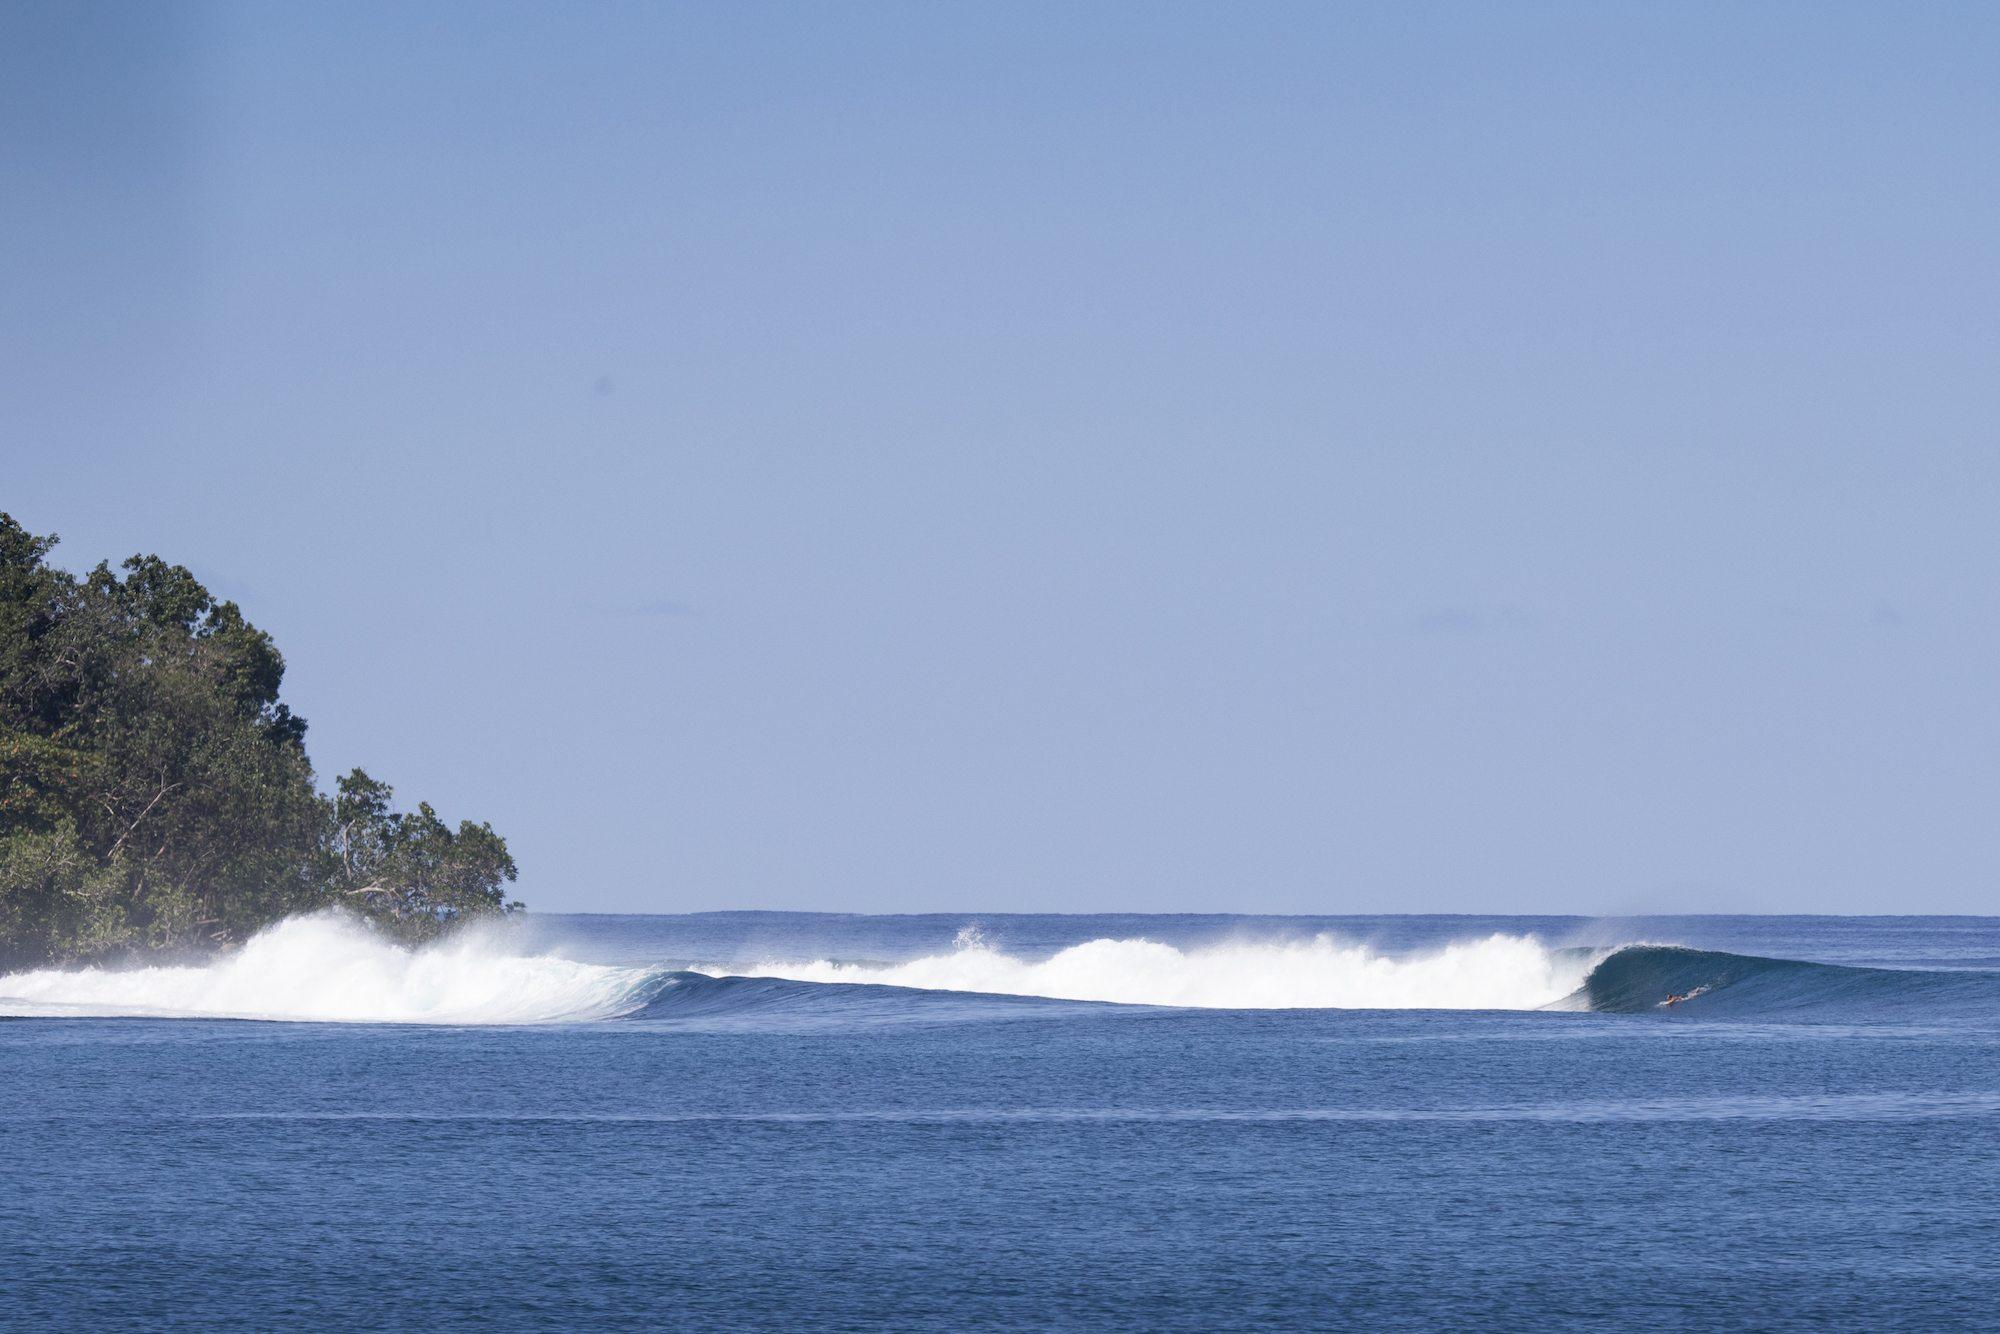 Clarets / Lolok Point / Bay of Plenty Lefts 15